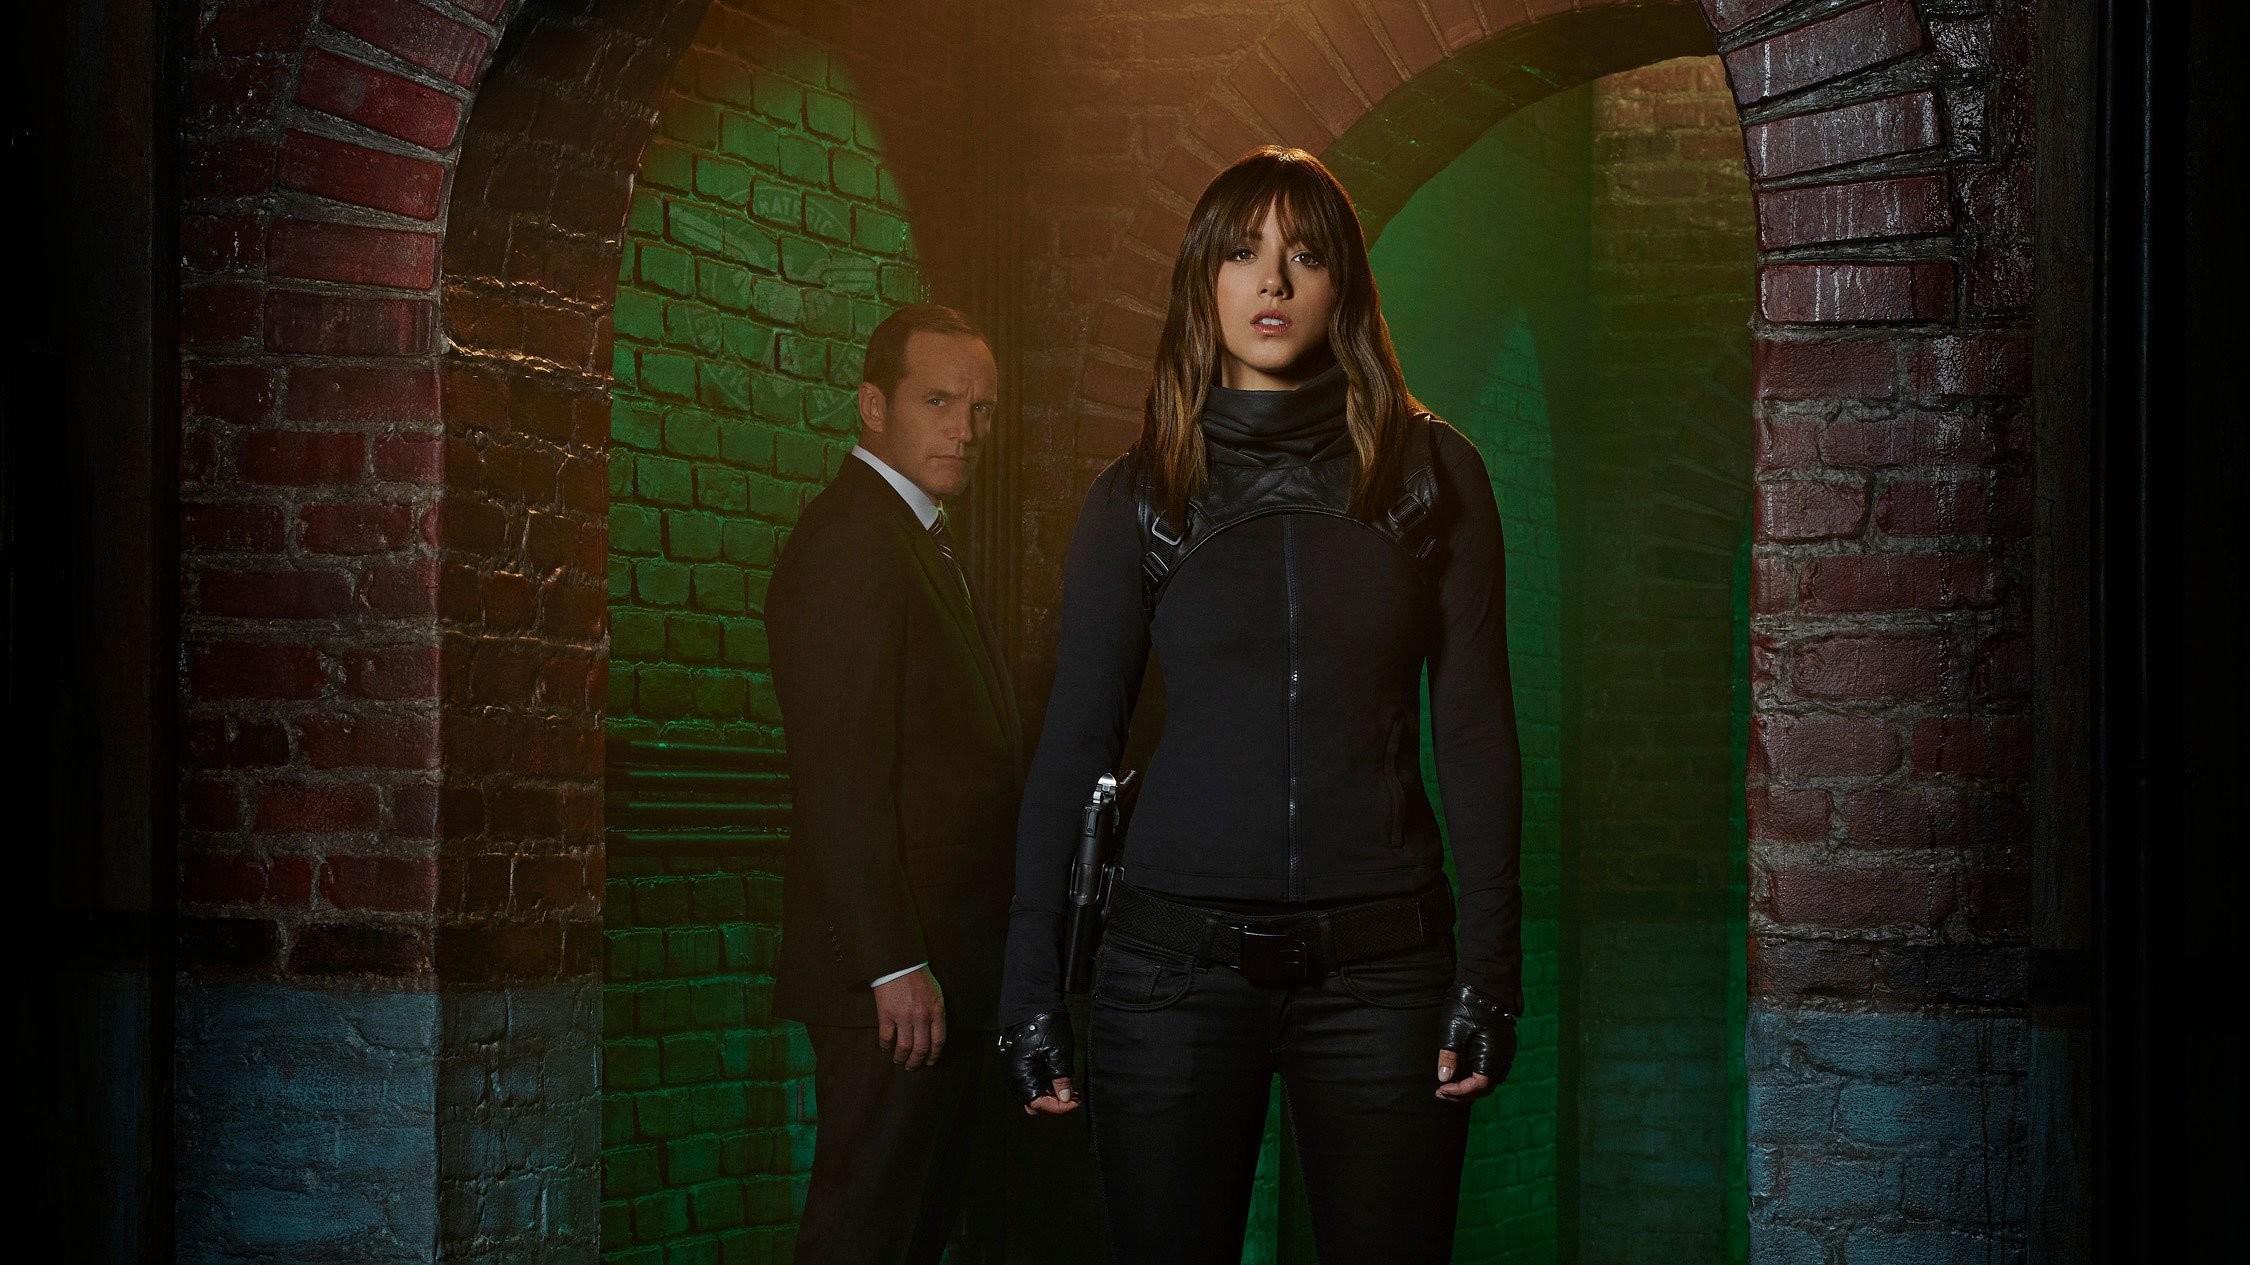 TV Show – Marvel's Agents of S.H.I.E.L.D. Daisy (Agents of S.H.I.E.L.D.)  Chloe Bennet Phil